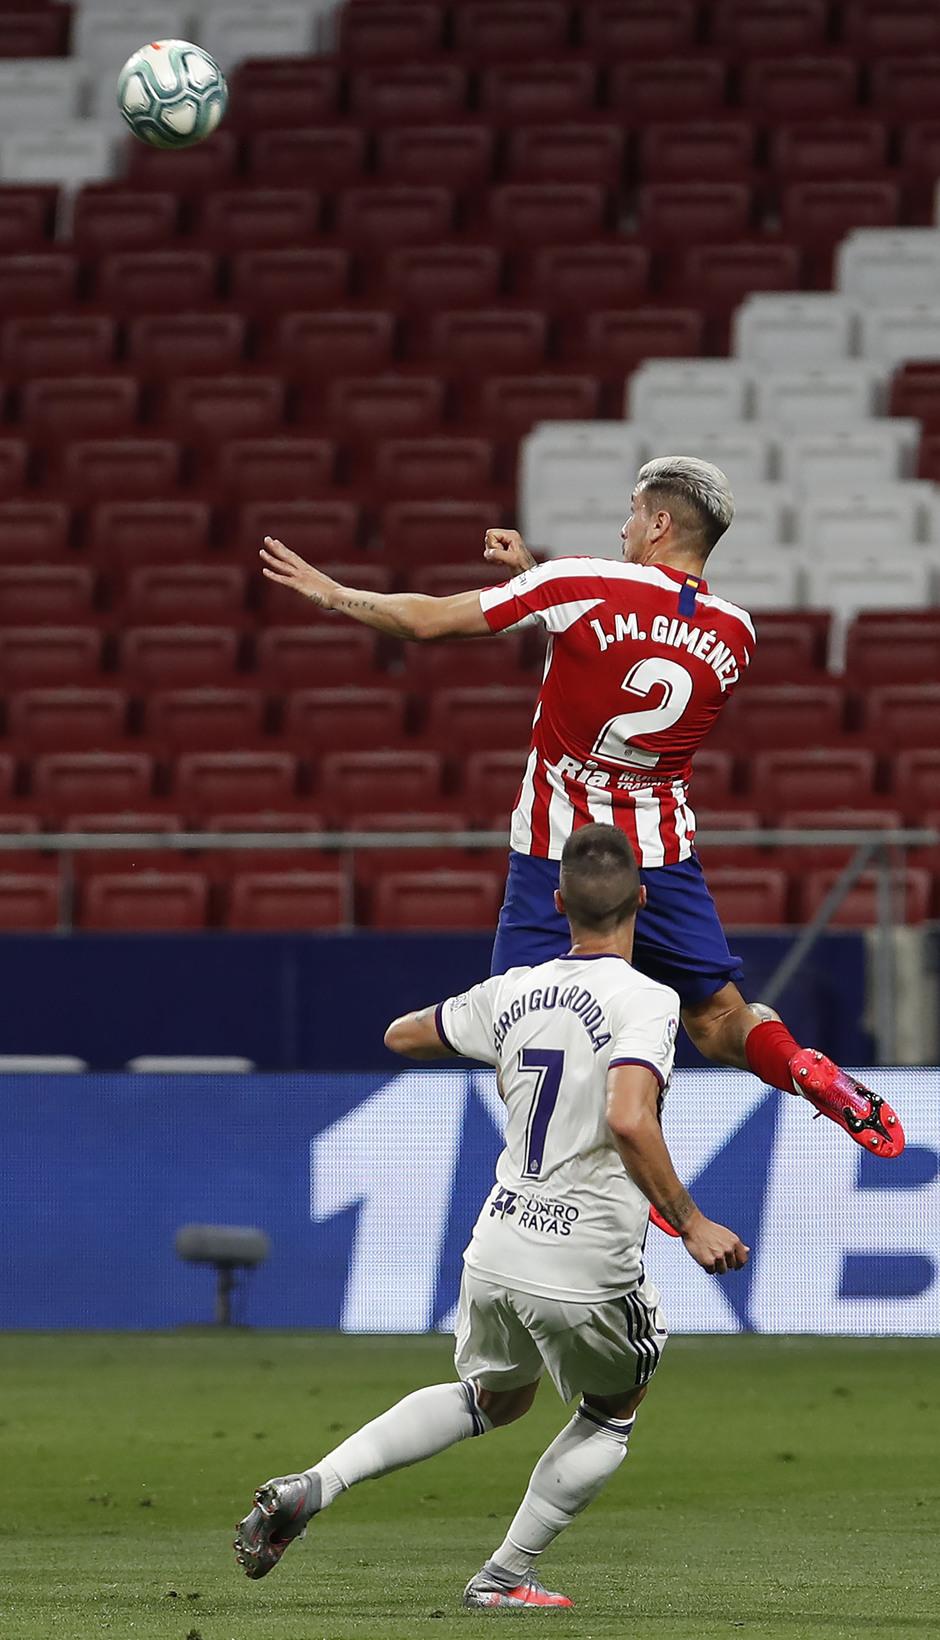 Temp 19/20 | Atlético de Madrid - Valladolid | Giménez